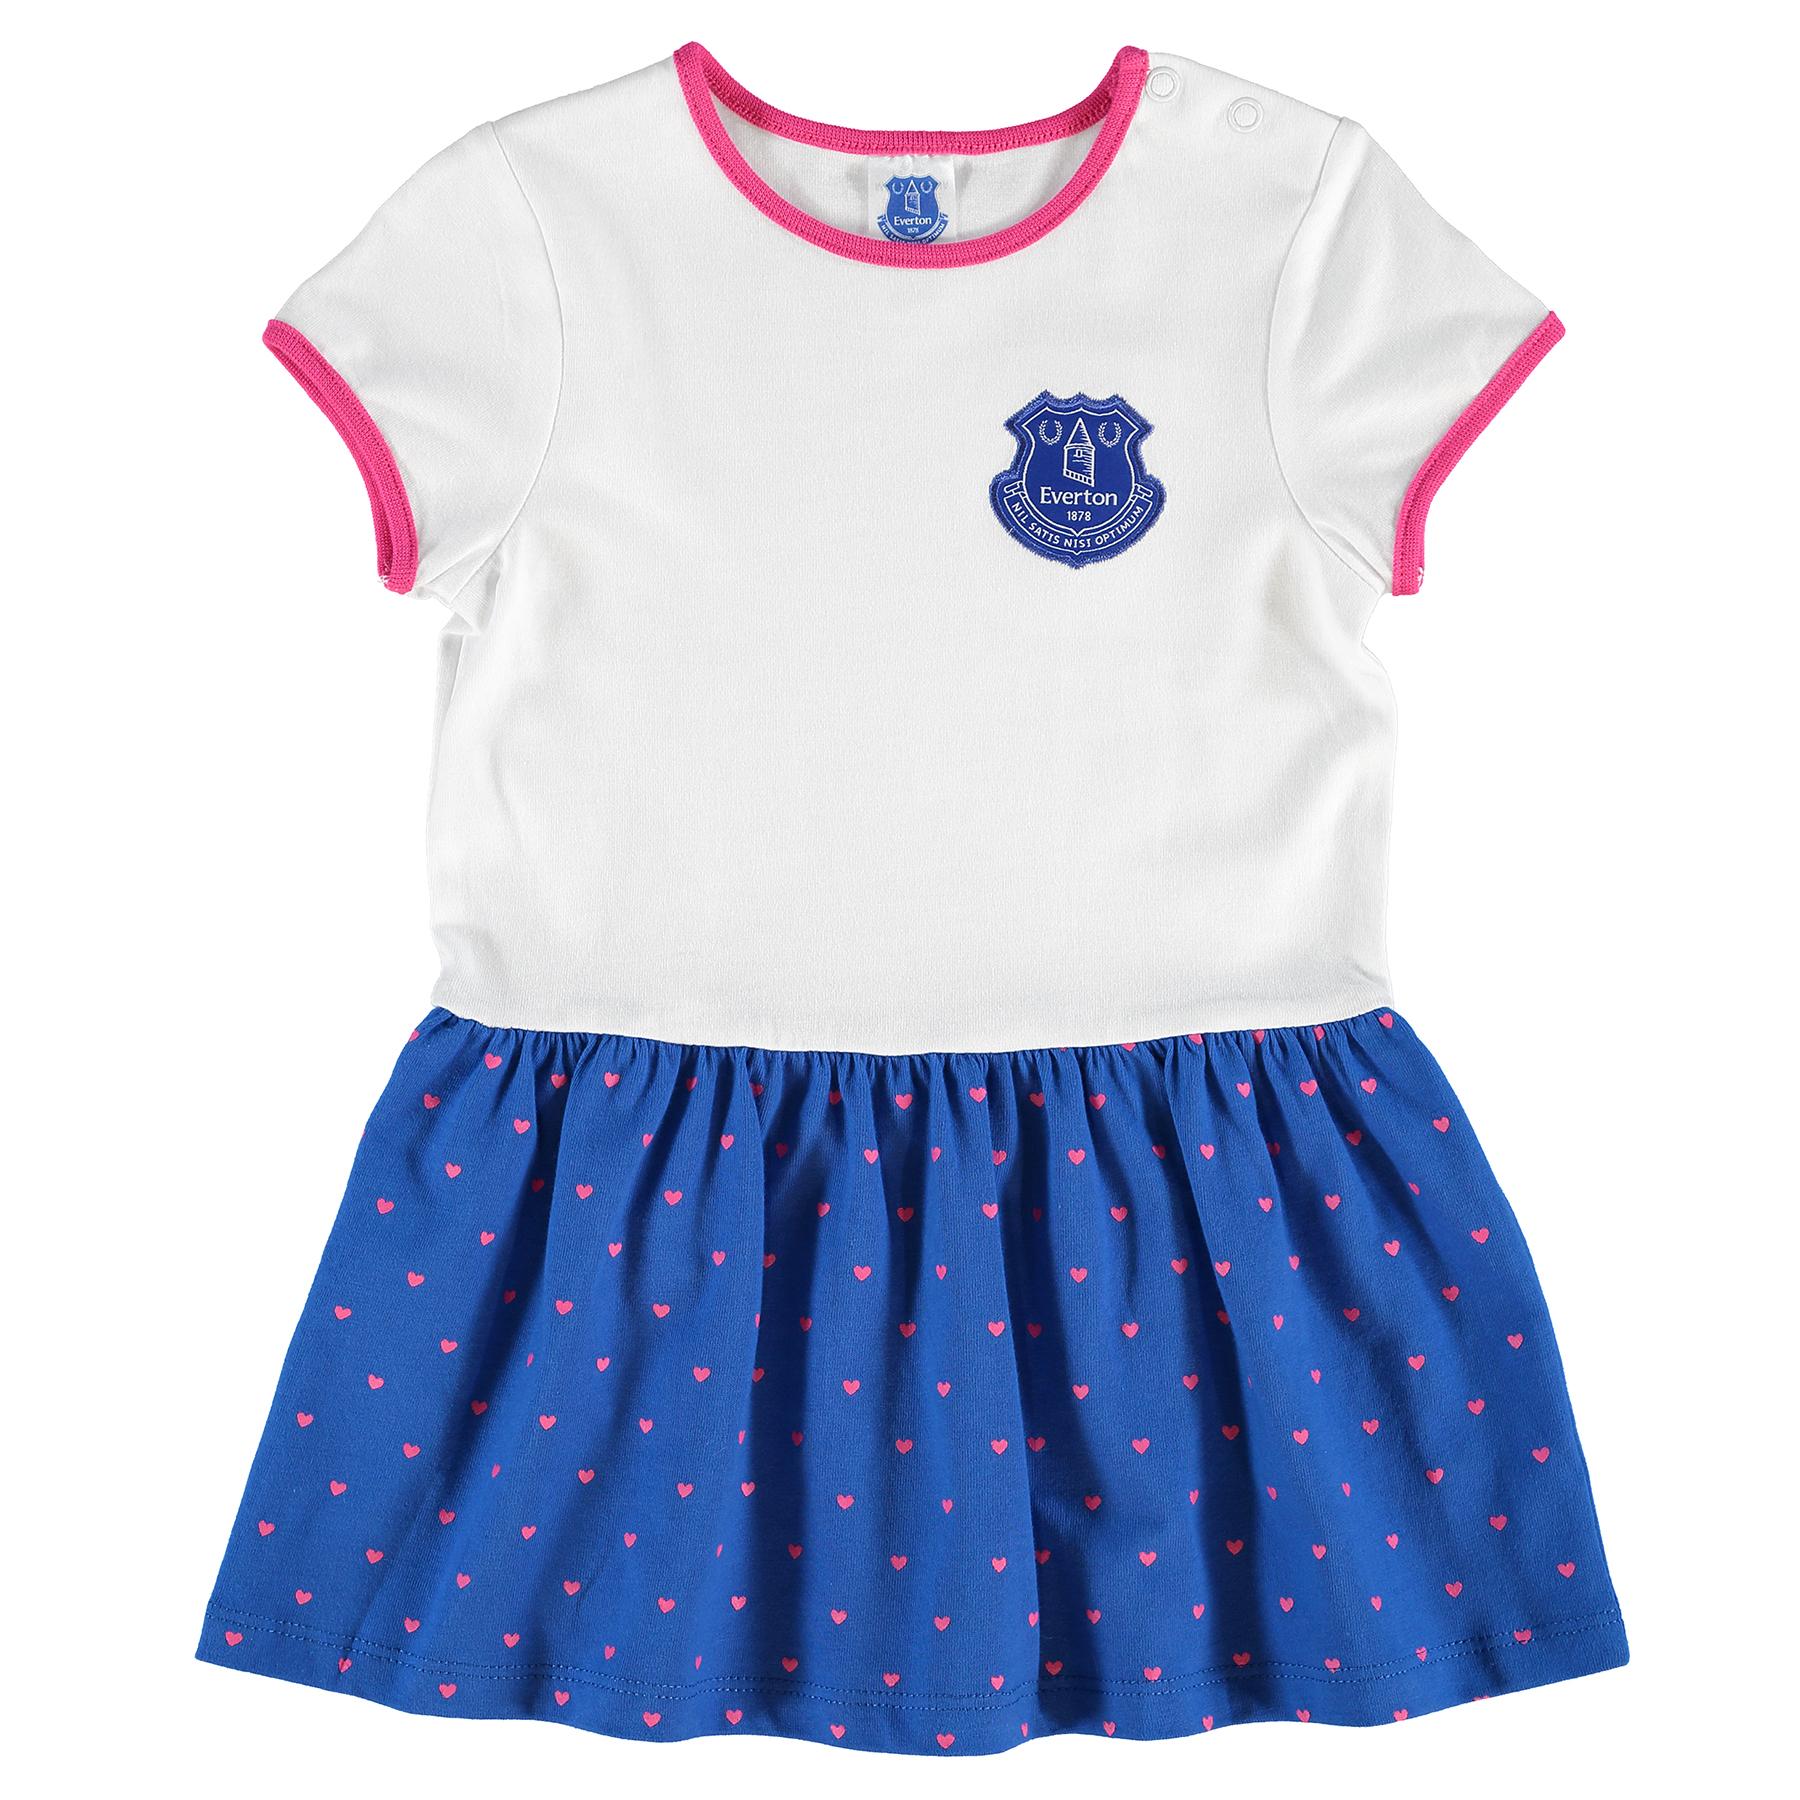 Everton Crest Dress - Royal/White - Baby